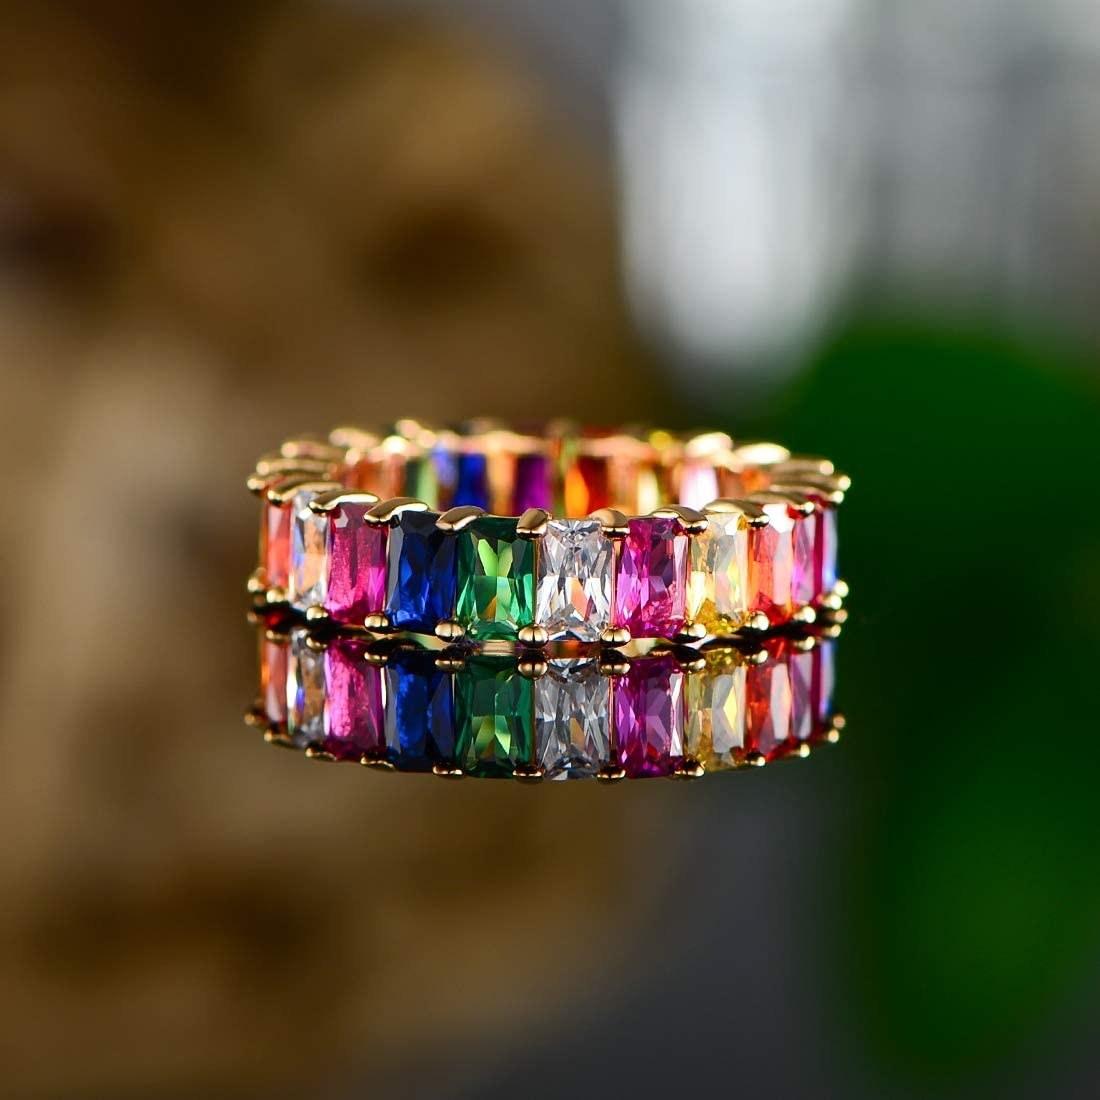 The rainbow ring